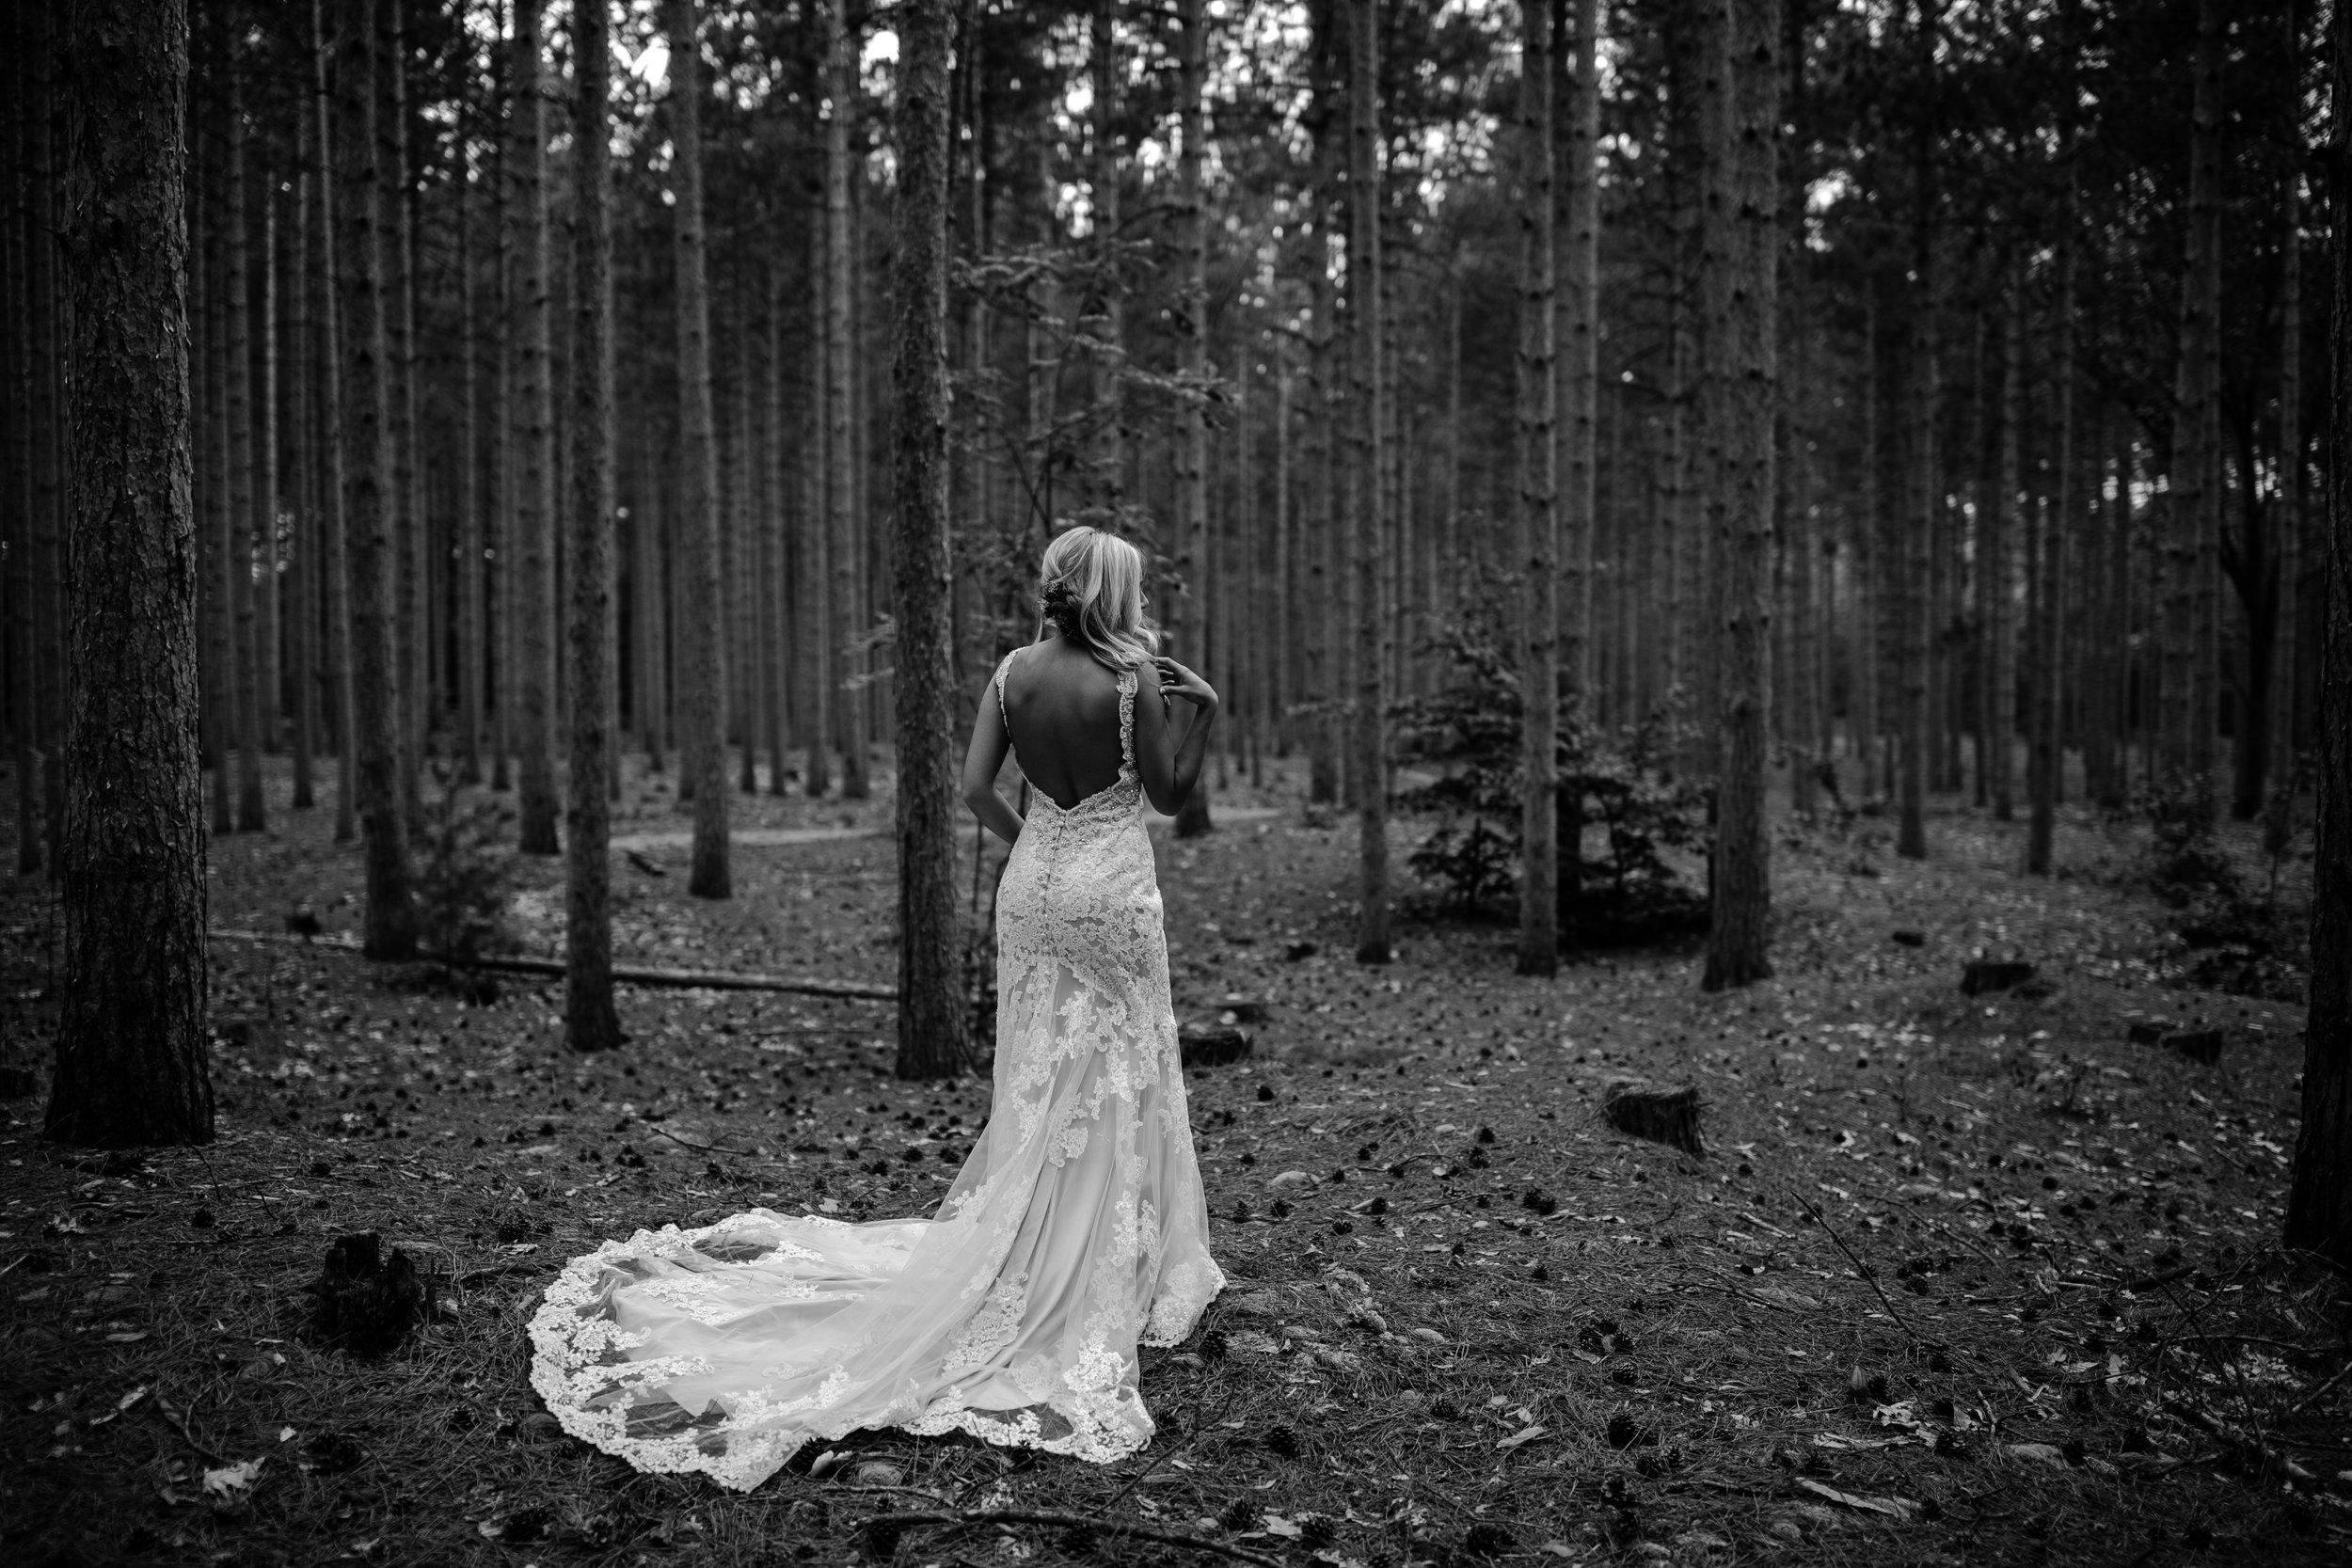 west-michigan-wedding-photographer-whitehall-rachel-austin-chapel-in-the-pines-536.jpg